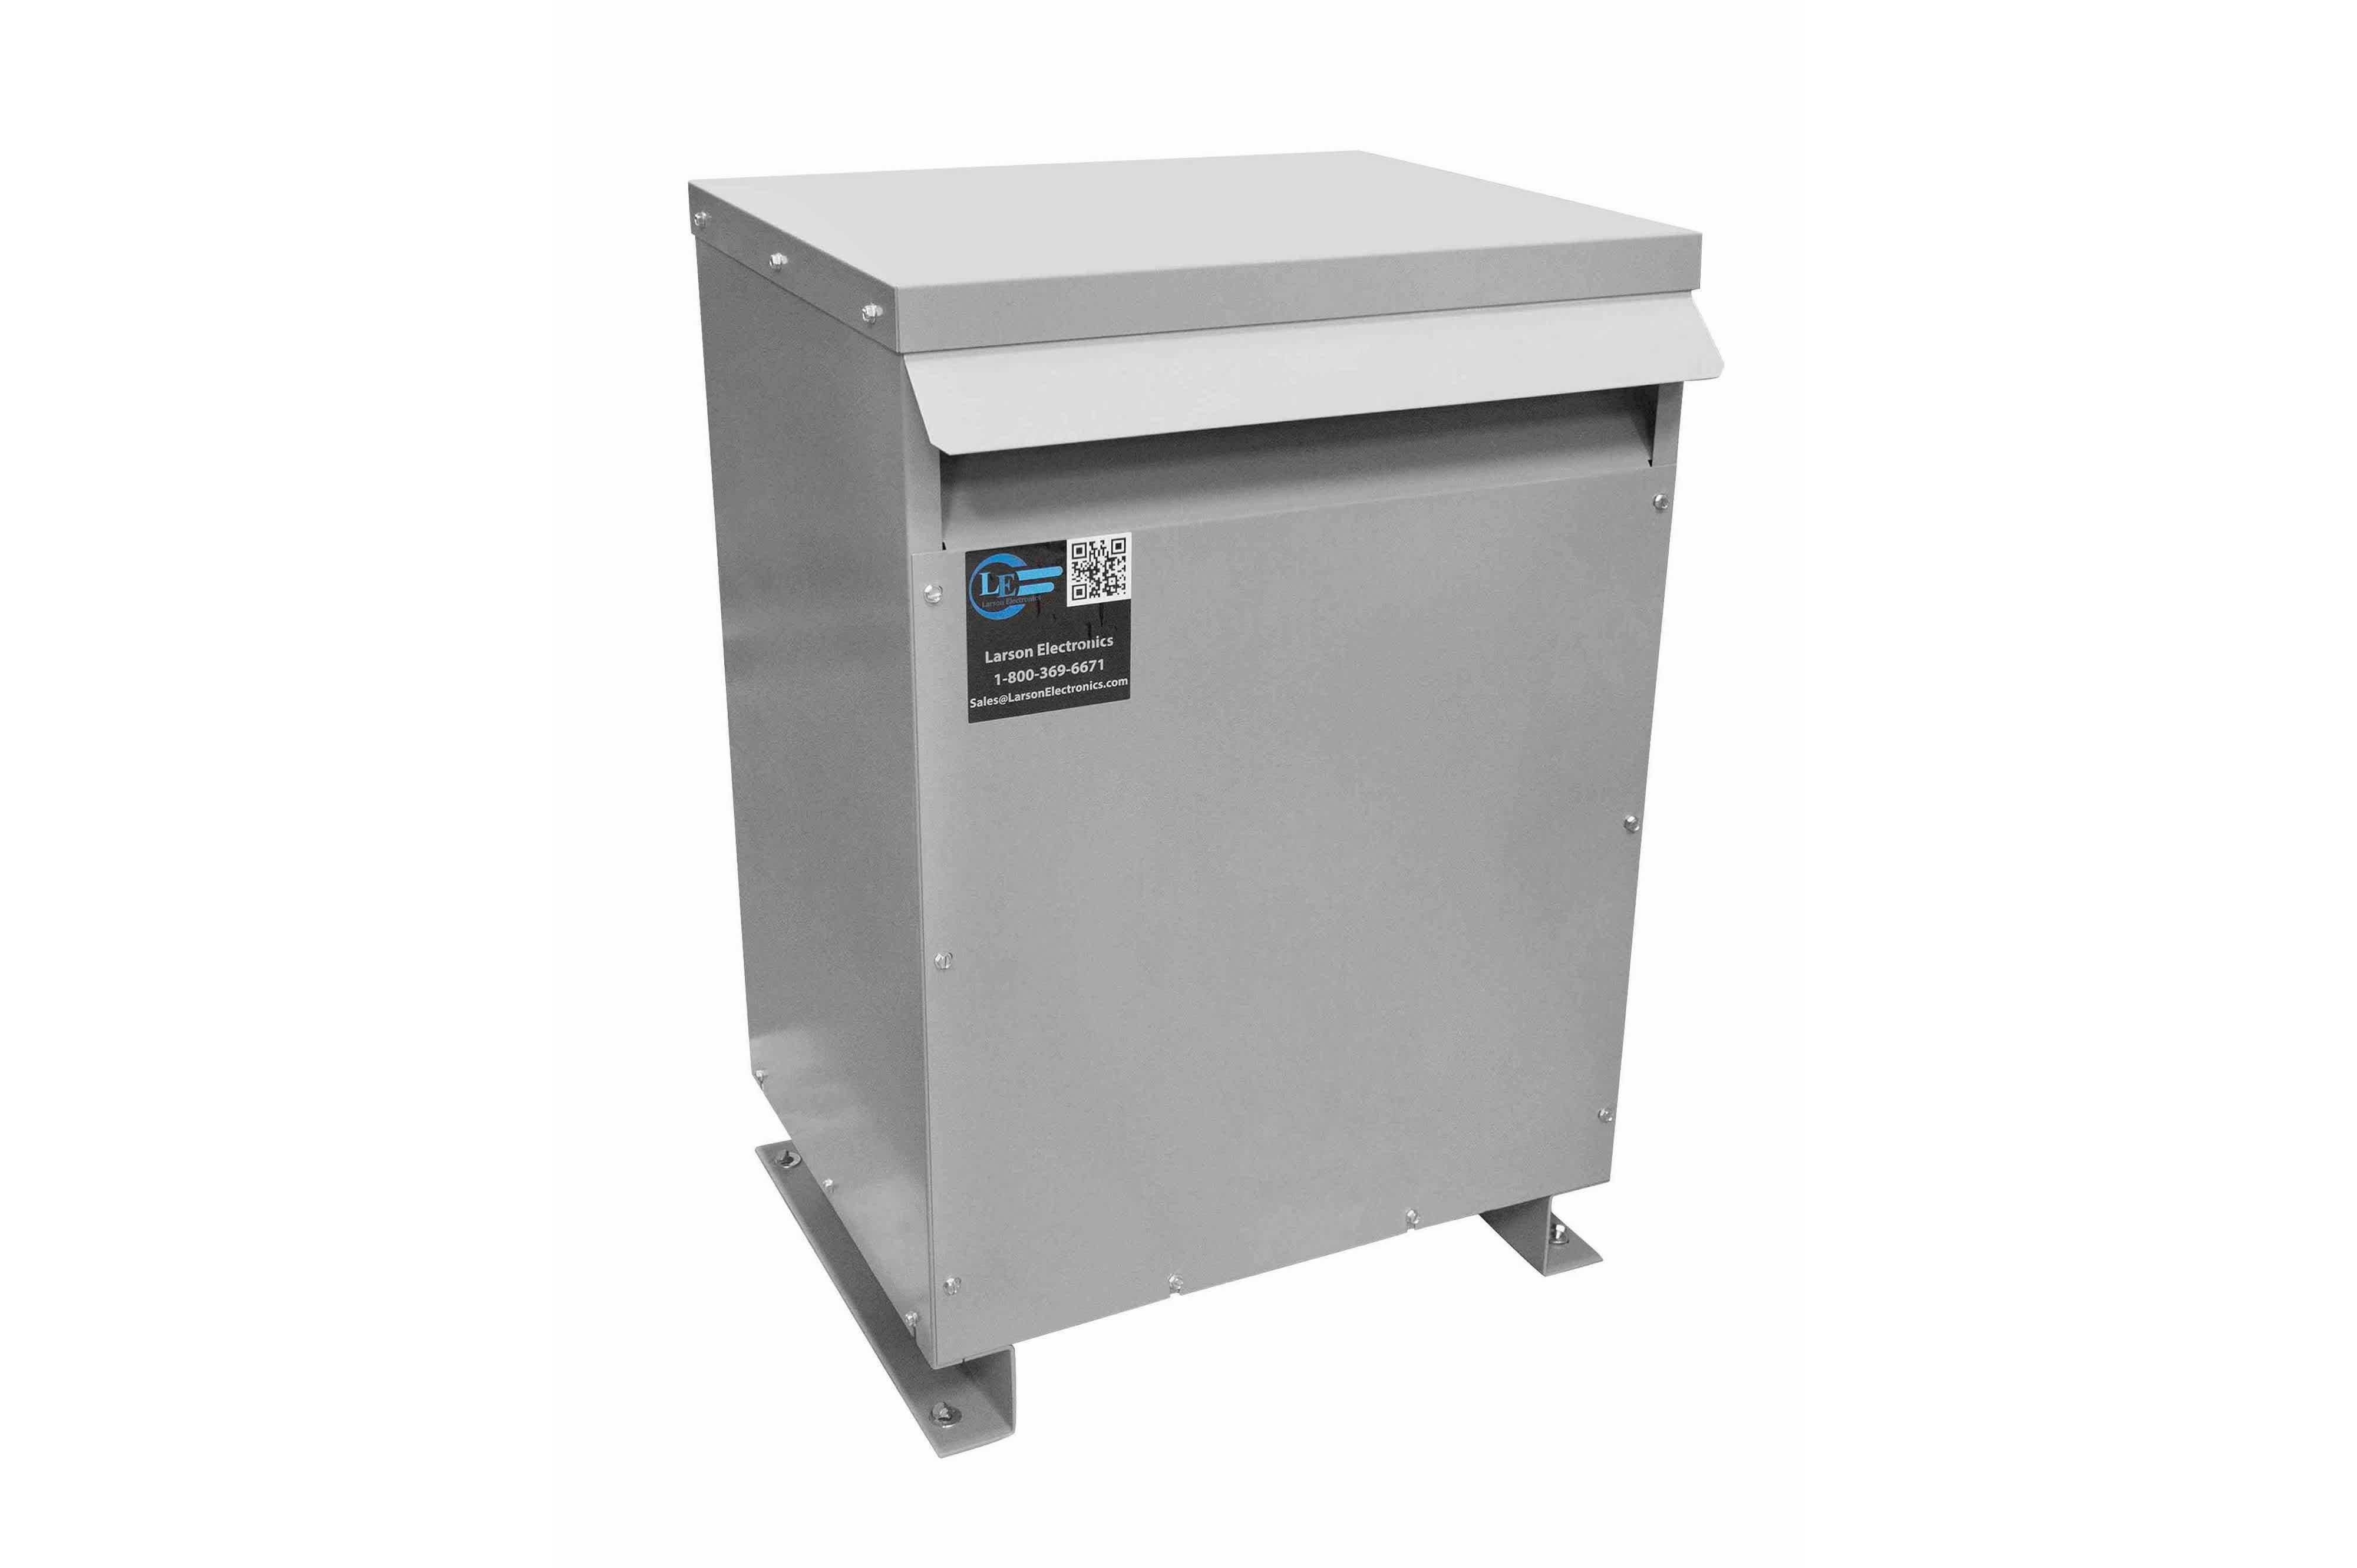 300 kVA 3PH Isolation Transformer, 460V Wye Primary, 380Y/220 Wye-N Secondary, N3R, Ventilated, 60 Hz